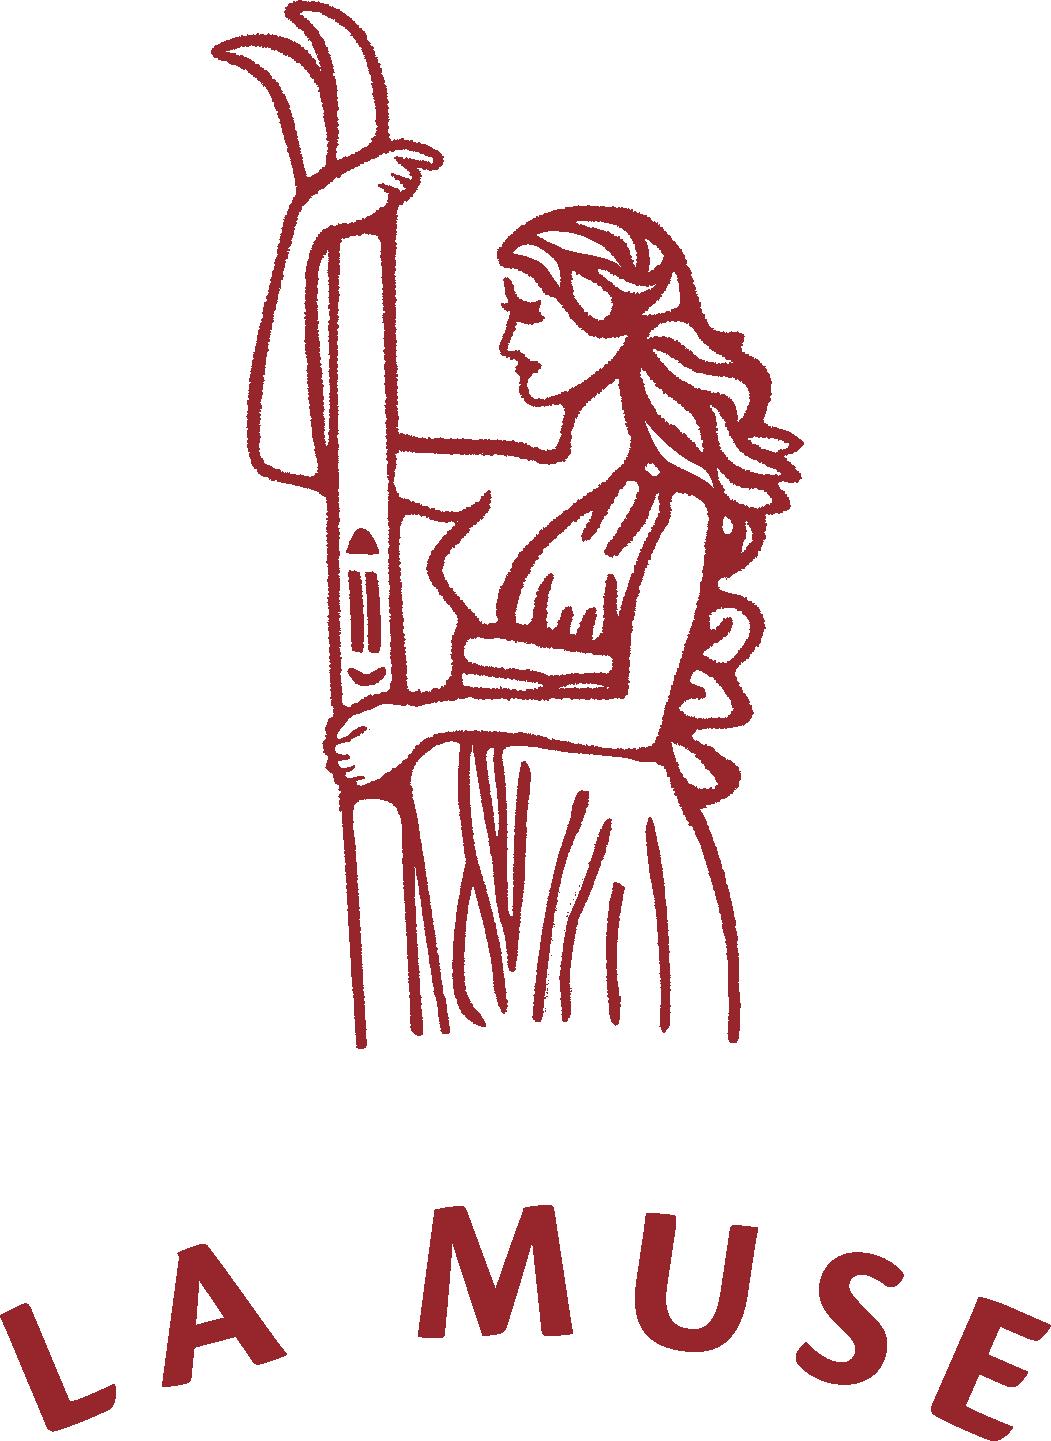 La muse restaurant logo